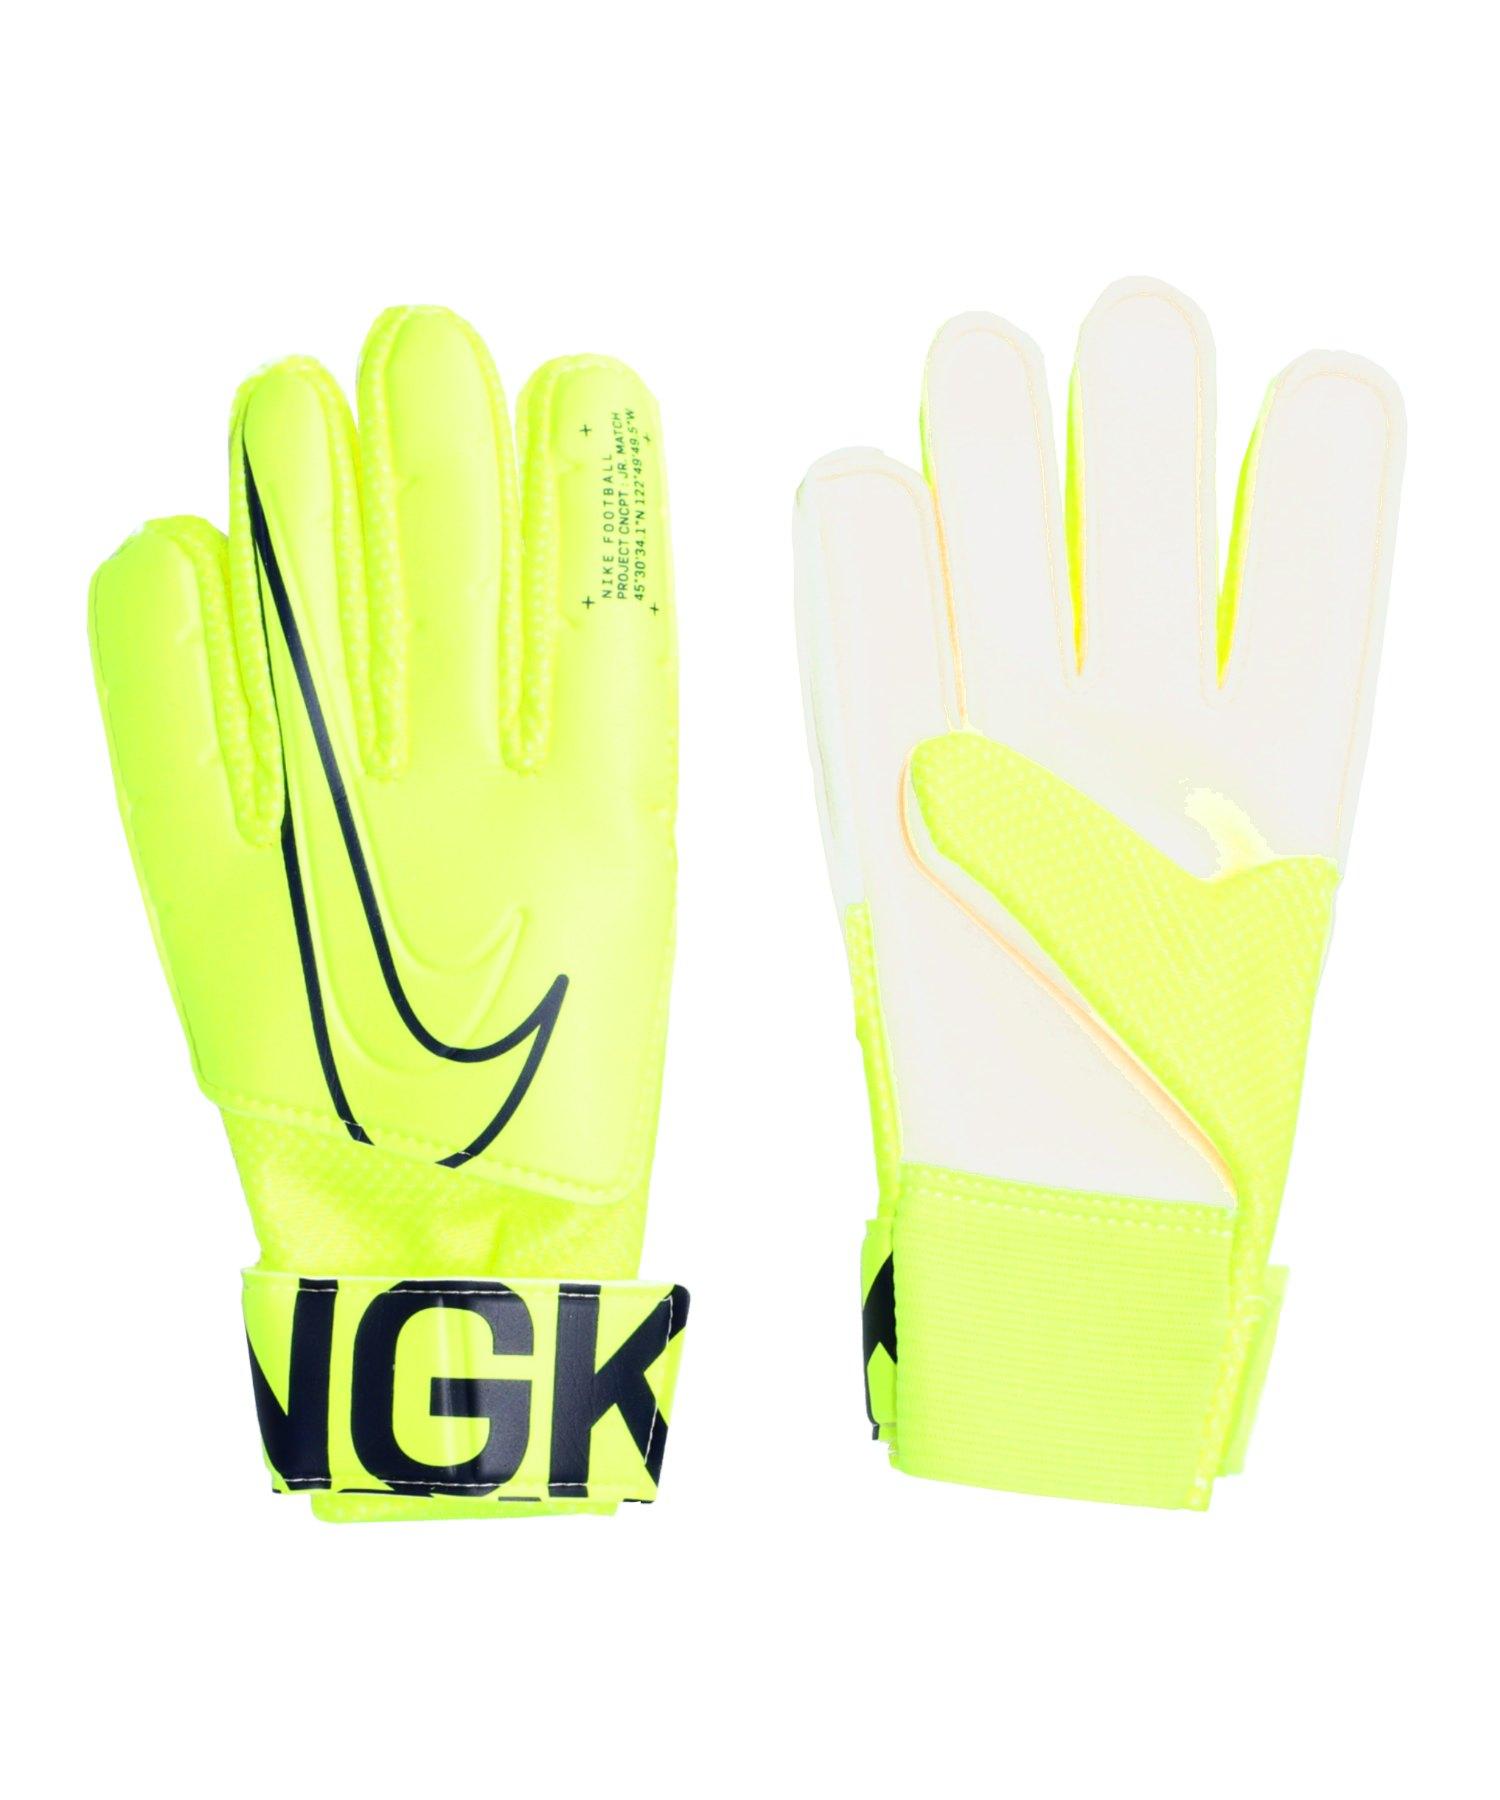 Nike Match Torwarthandschuh Kids Gelb F702 - gelb